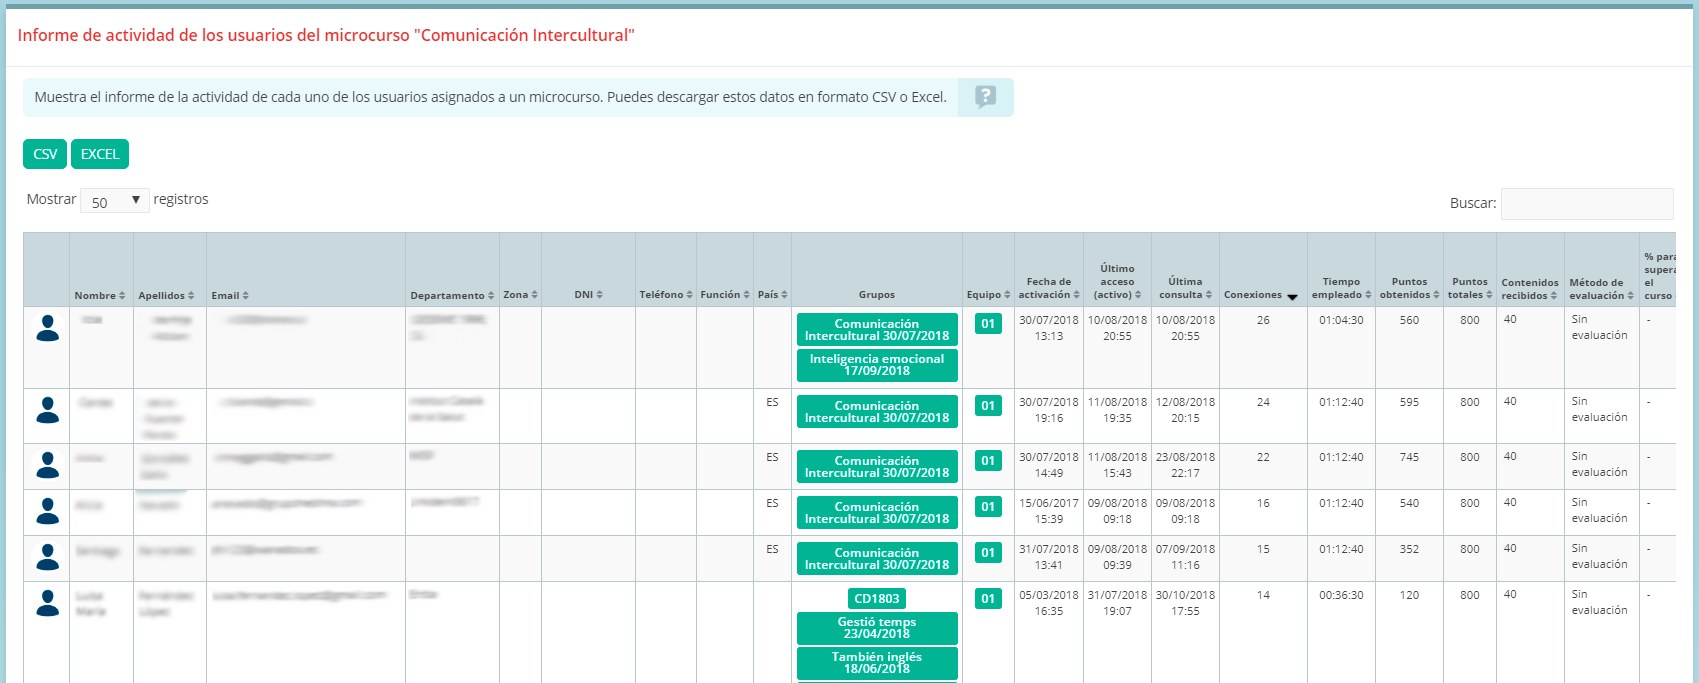 Captura del Informe de usuarios del microcurso